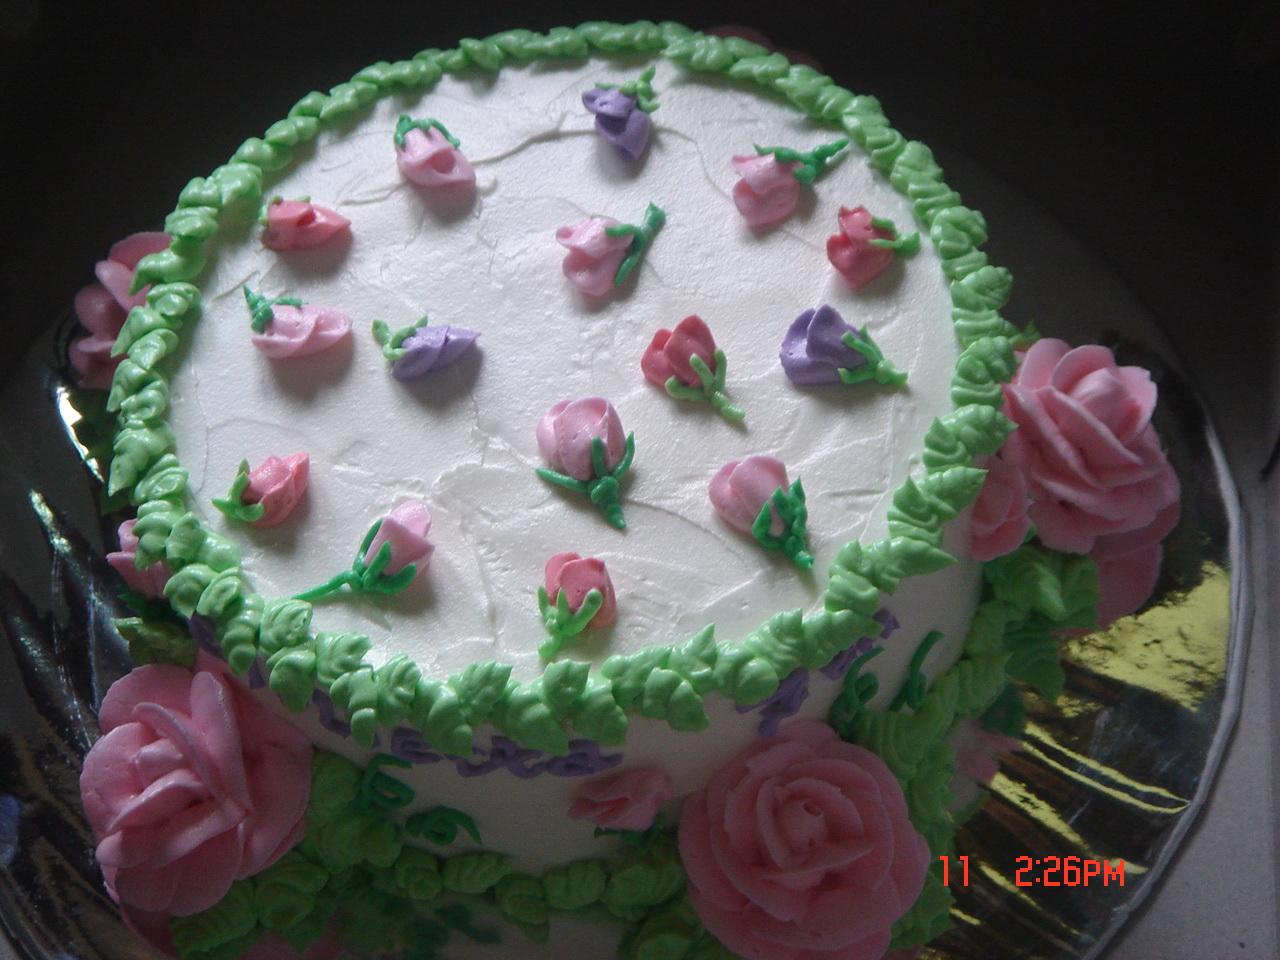 homemade: birthday cake for my little princess